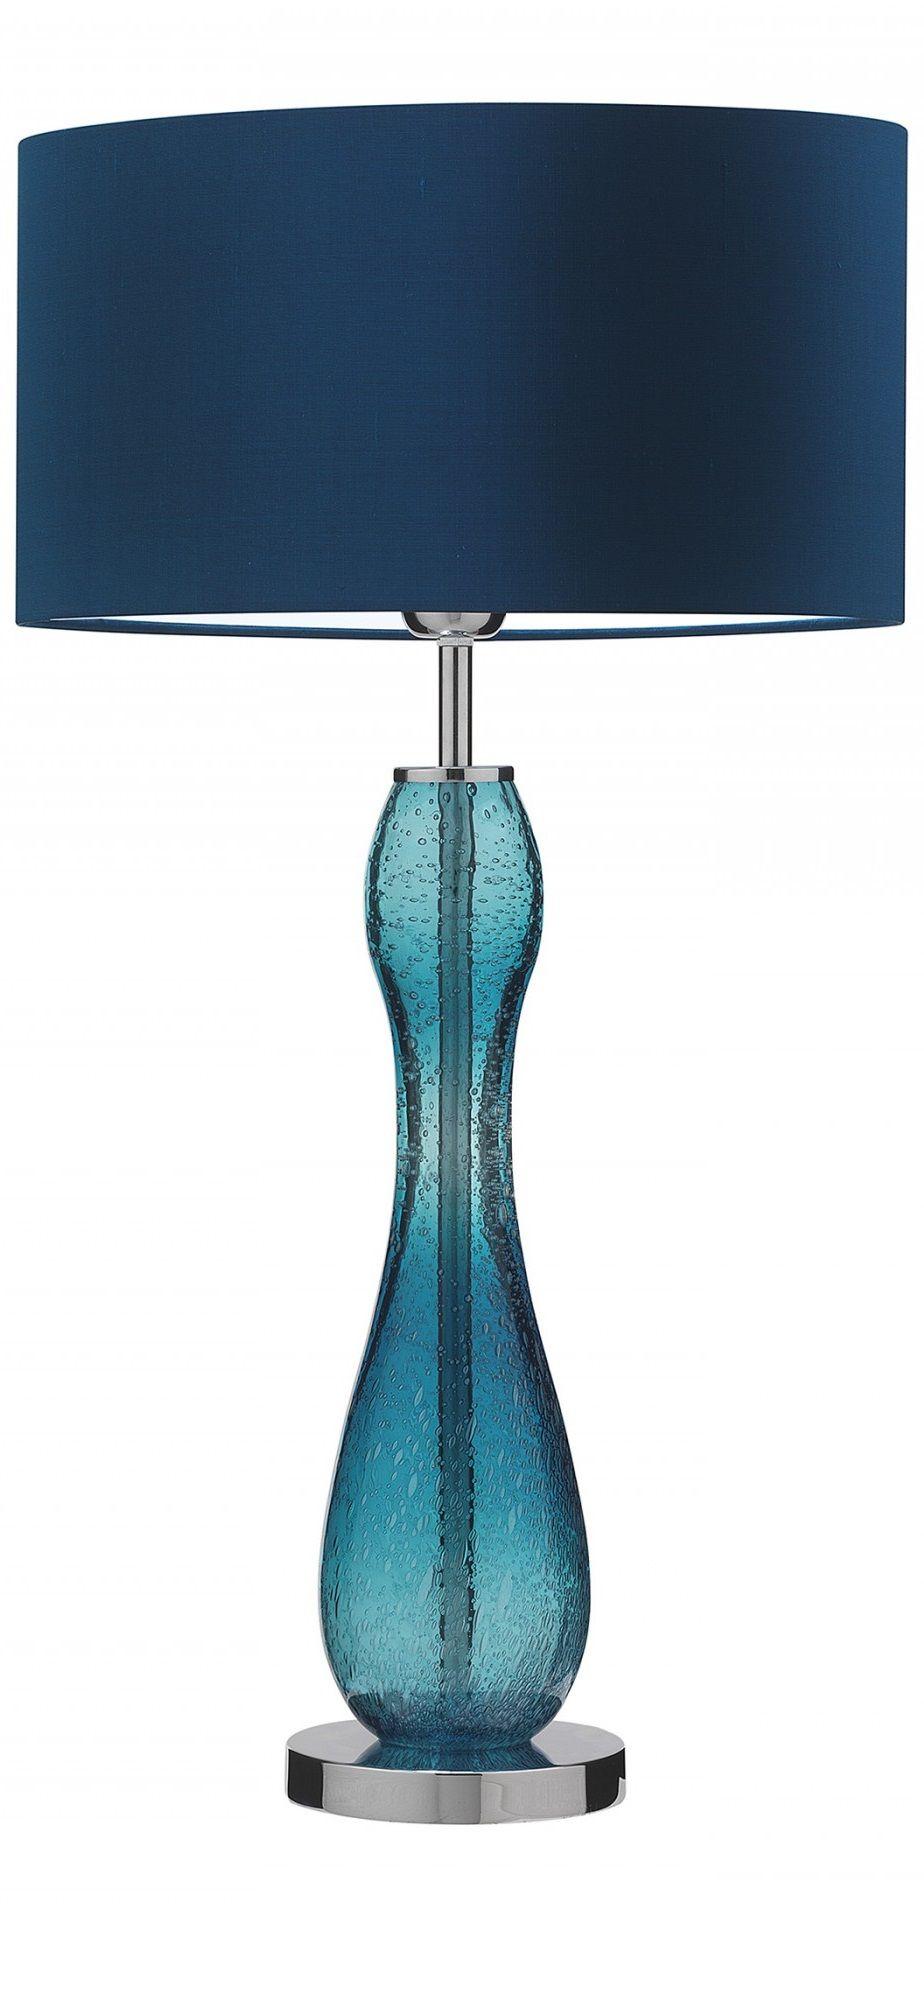 Blue modern table lamp -  Blue Blue Table Lamp Table Lamps Modern Table Lamps Contemporary Table